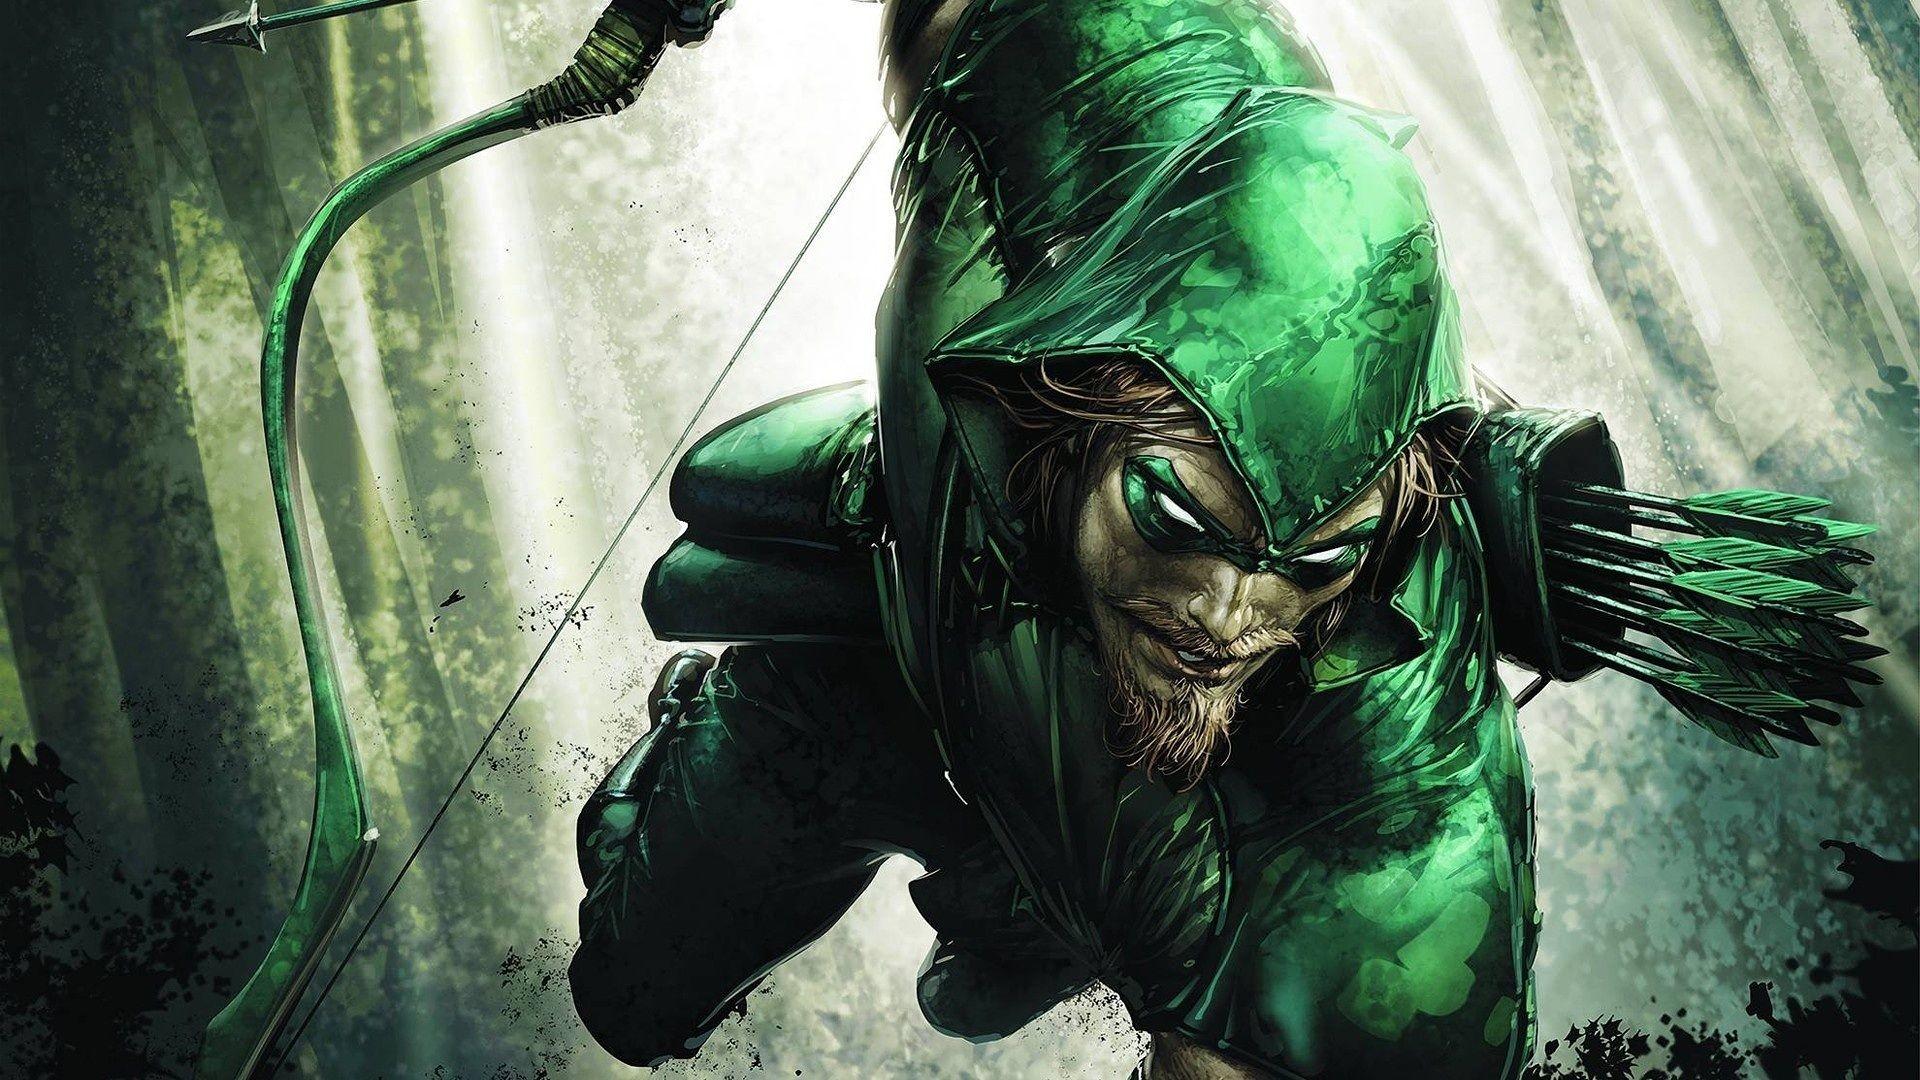 The Green Arrow Comic Artwork Cover Wallpaper